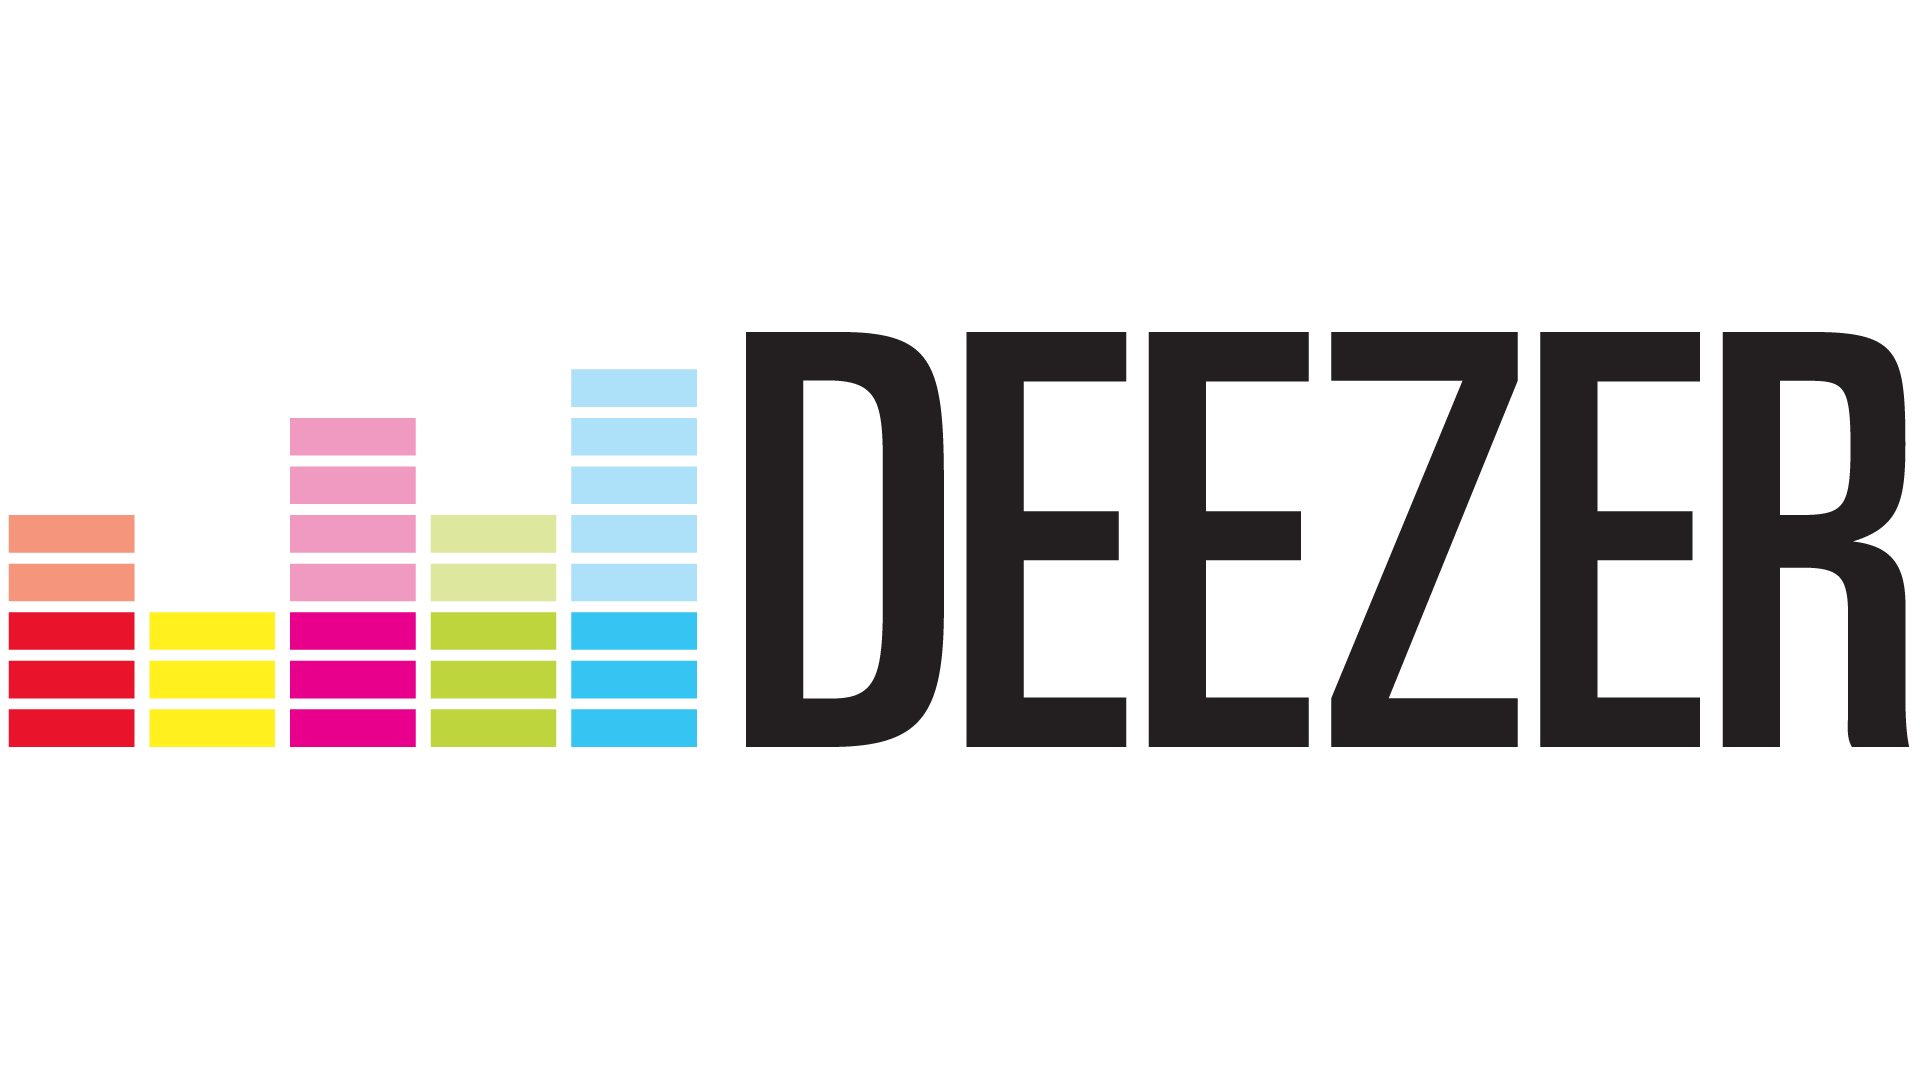 Deezer MP3